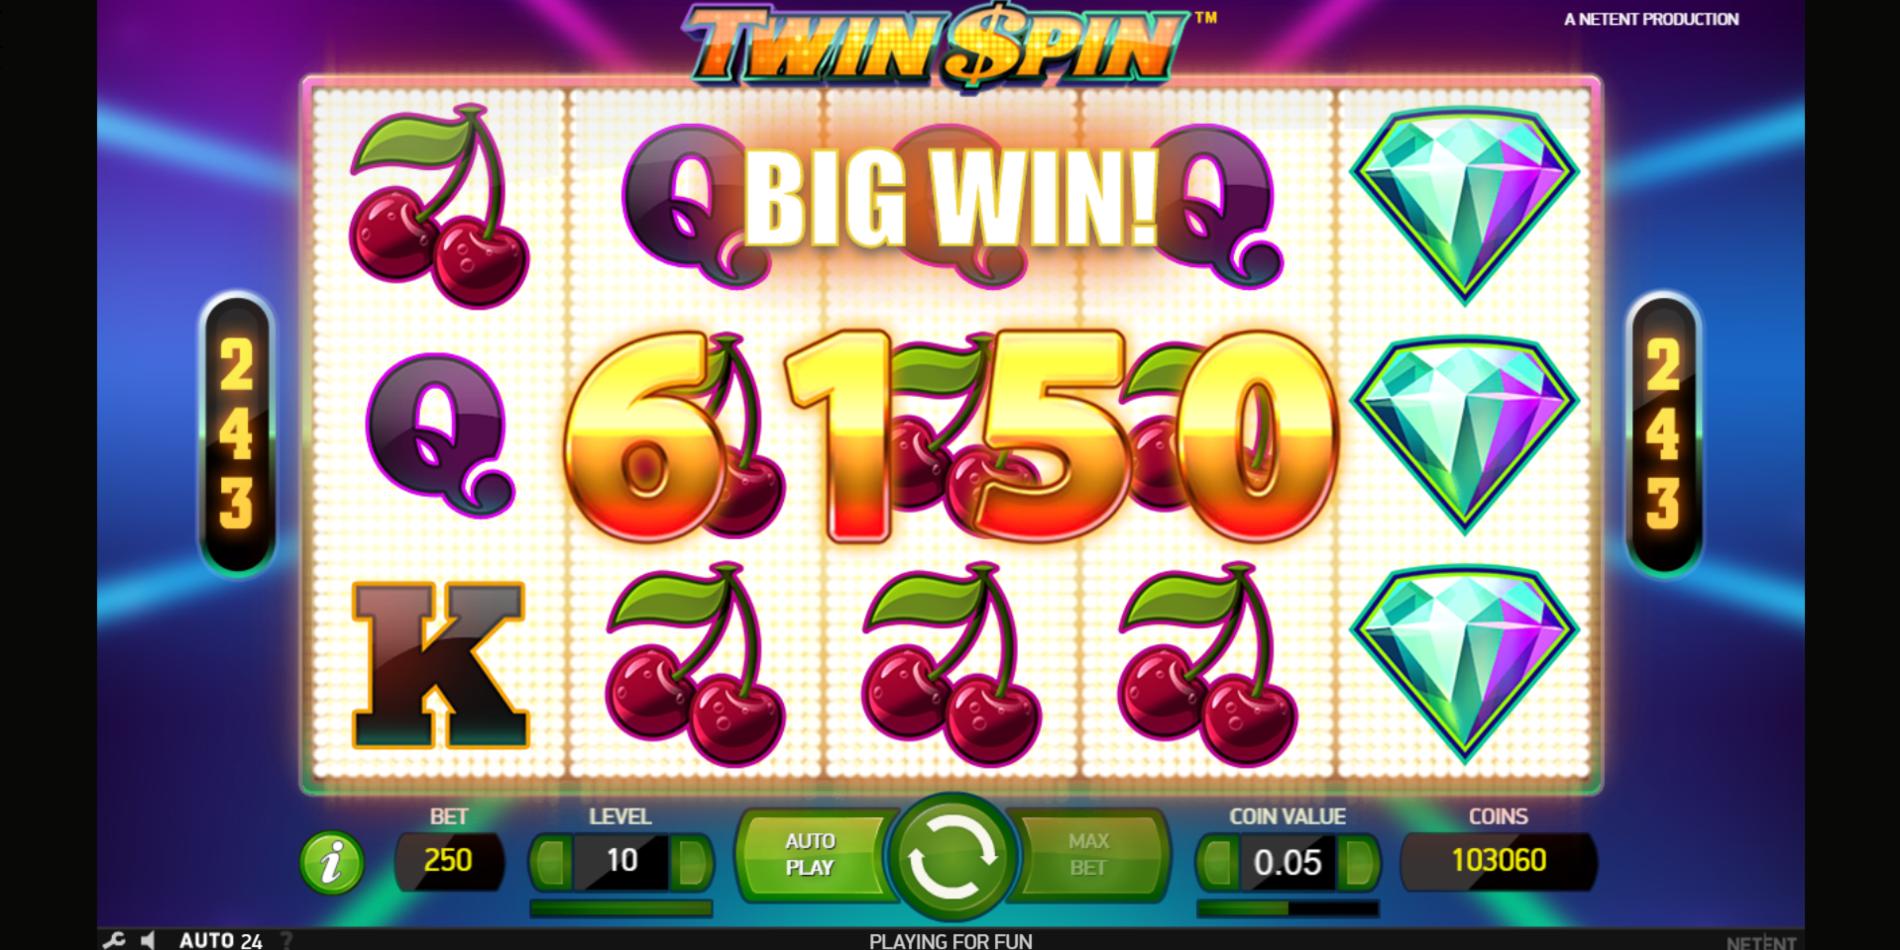 22bet betting